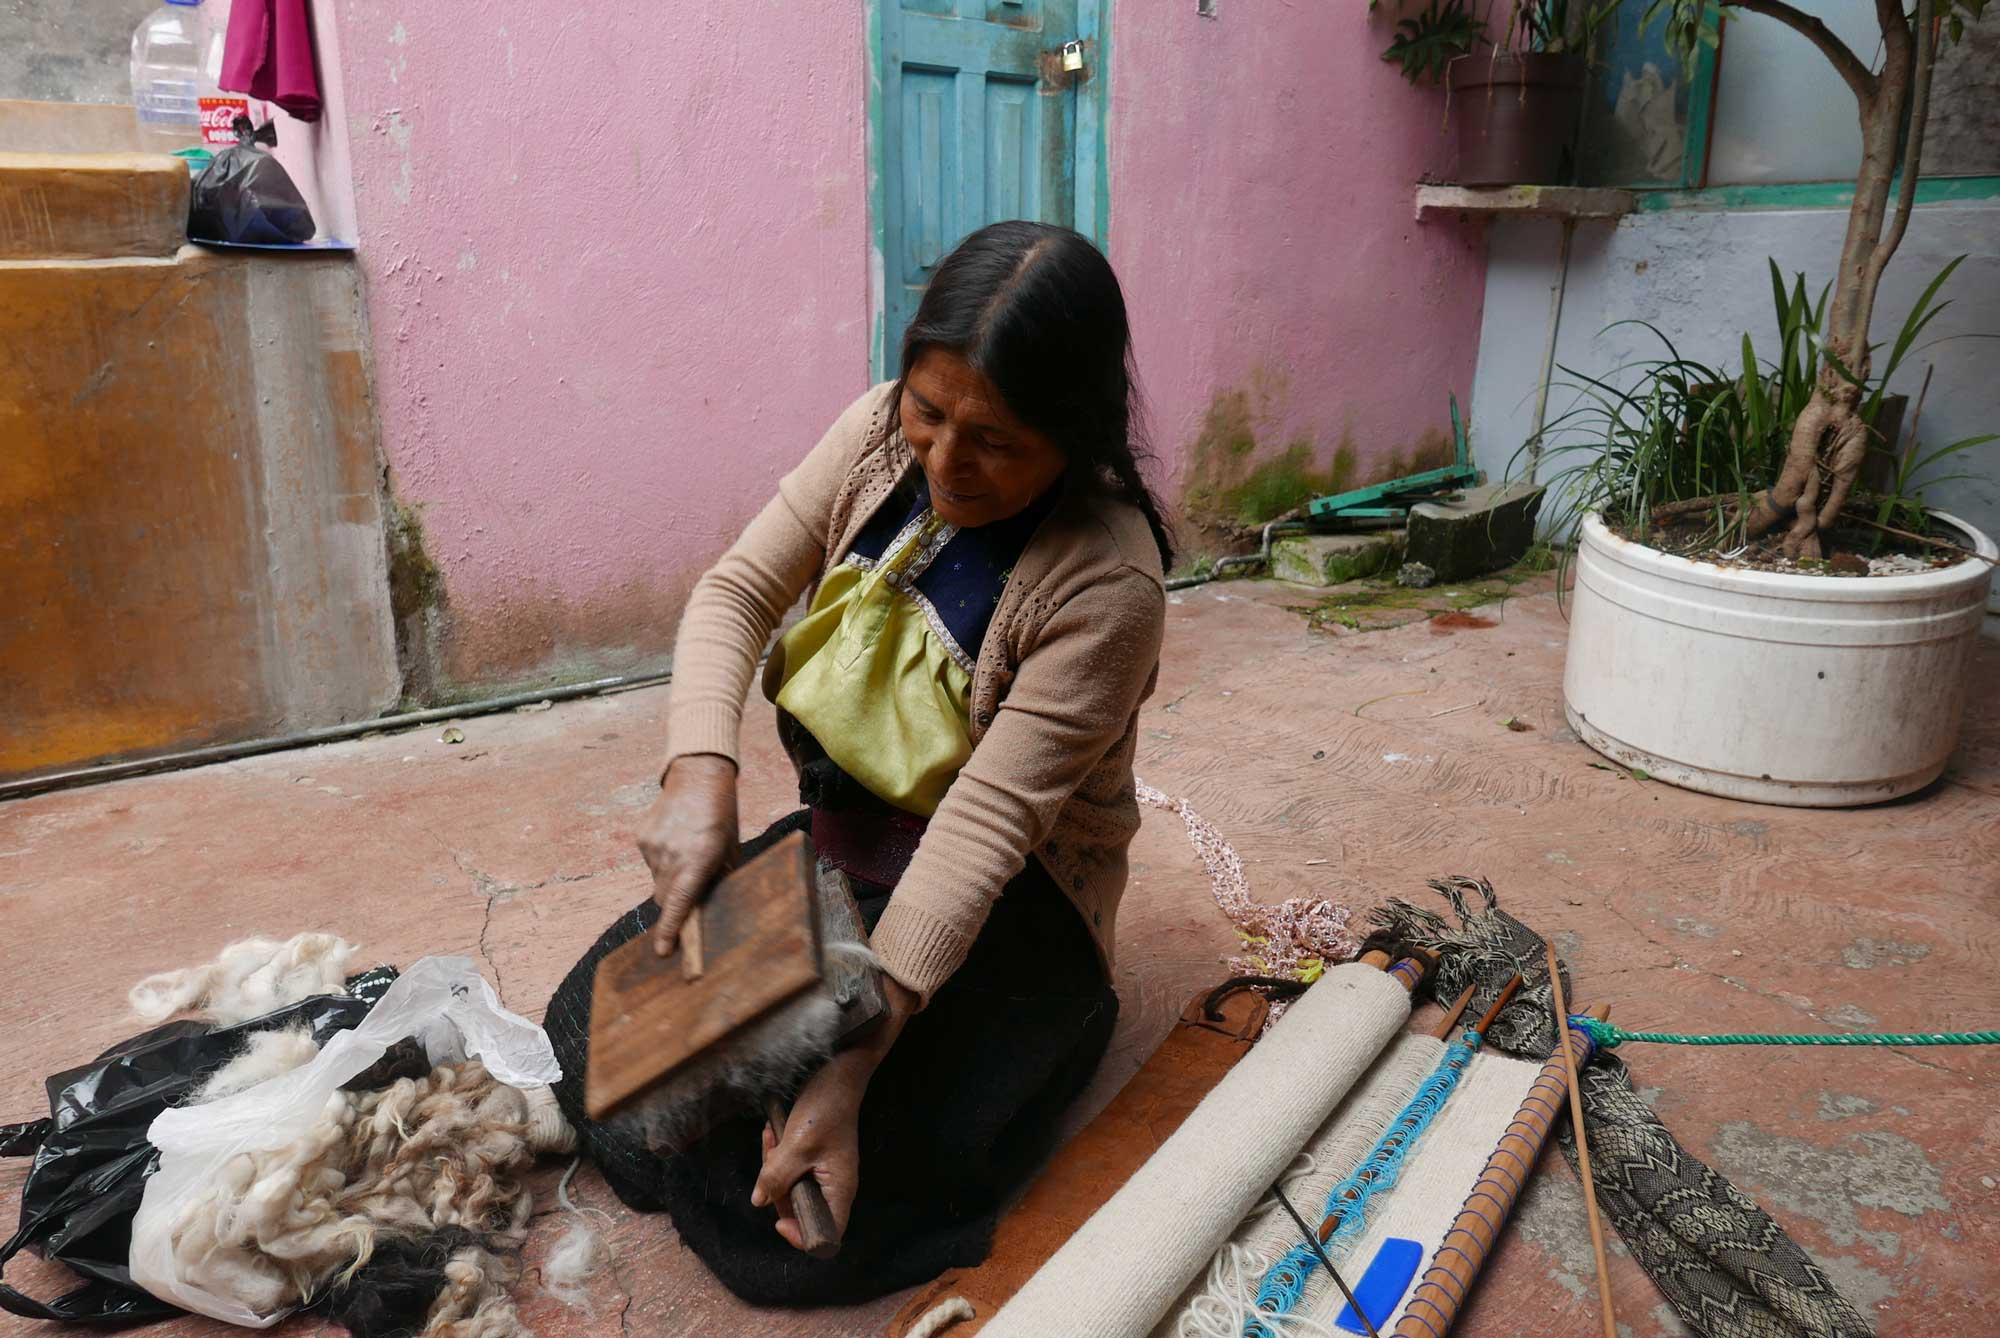 Artisan Carding Wool Textiles Chamula Chiapas Mexico